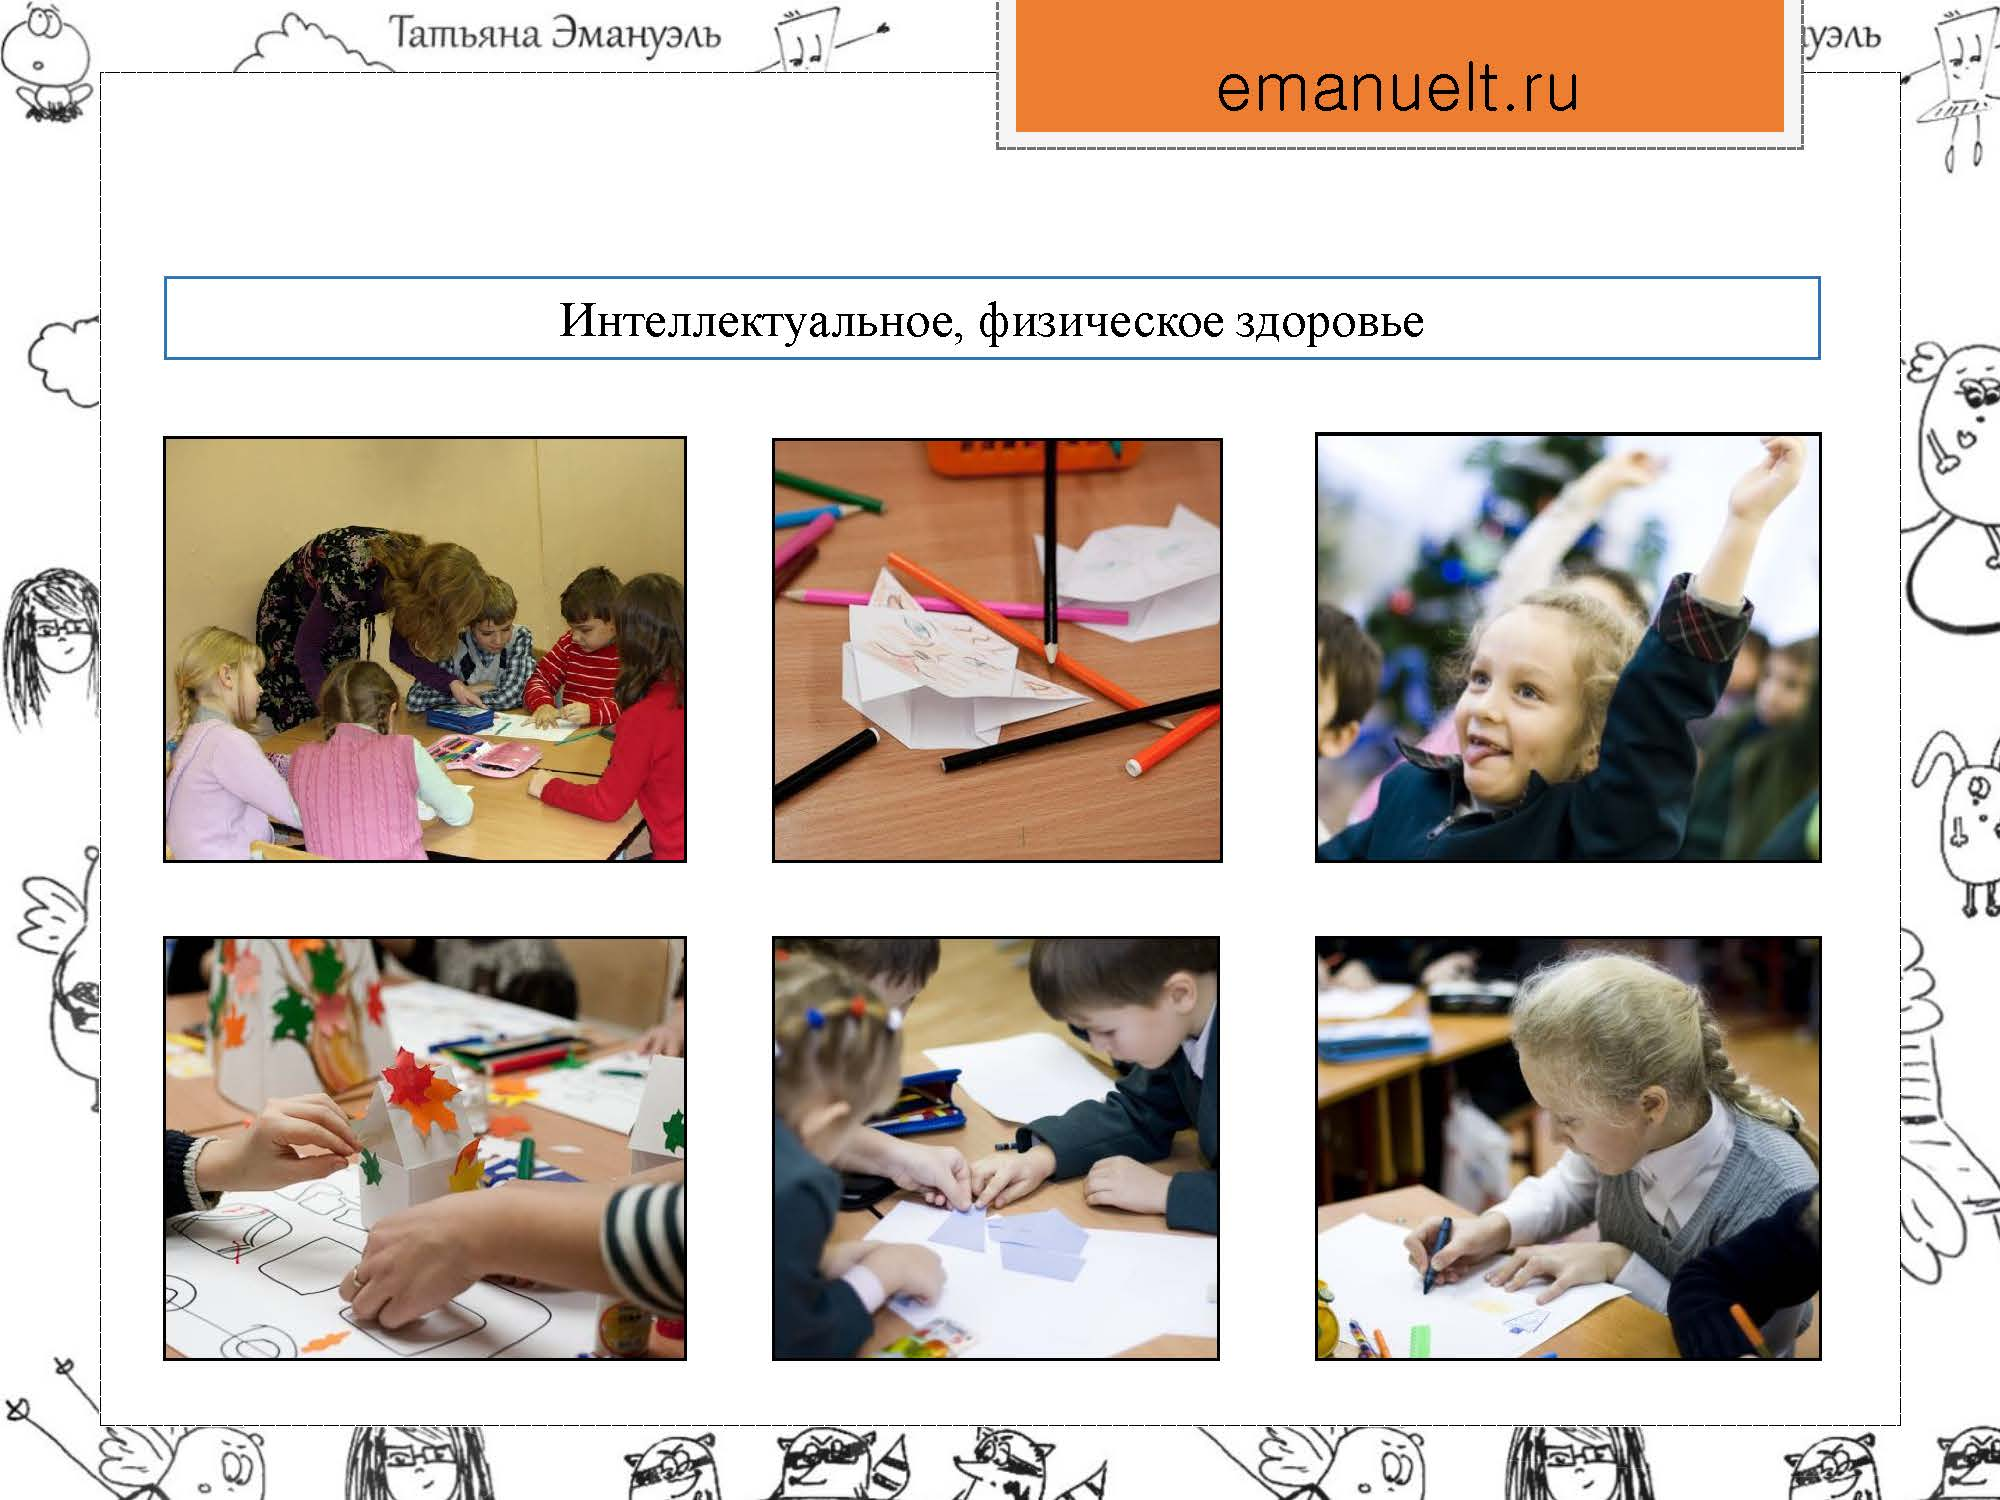 RazBeG_Emanuel_Страница_22